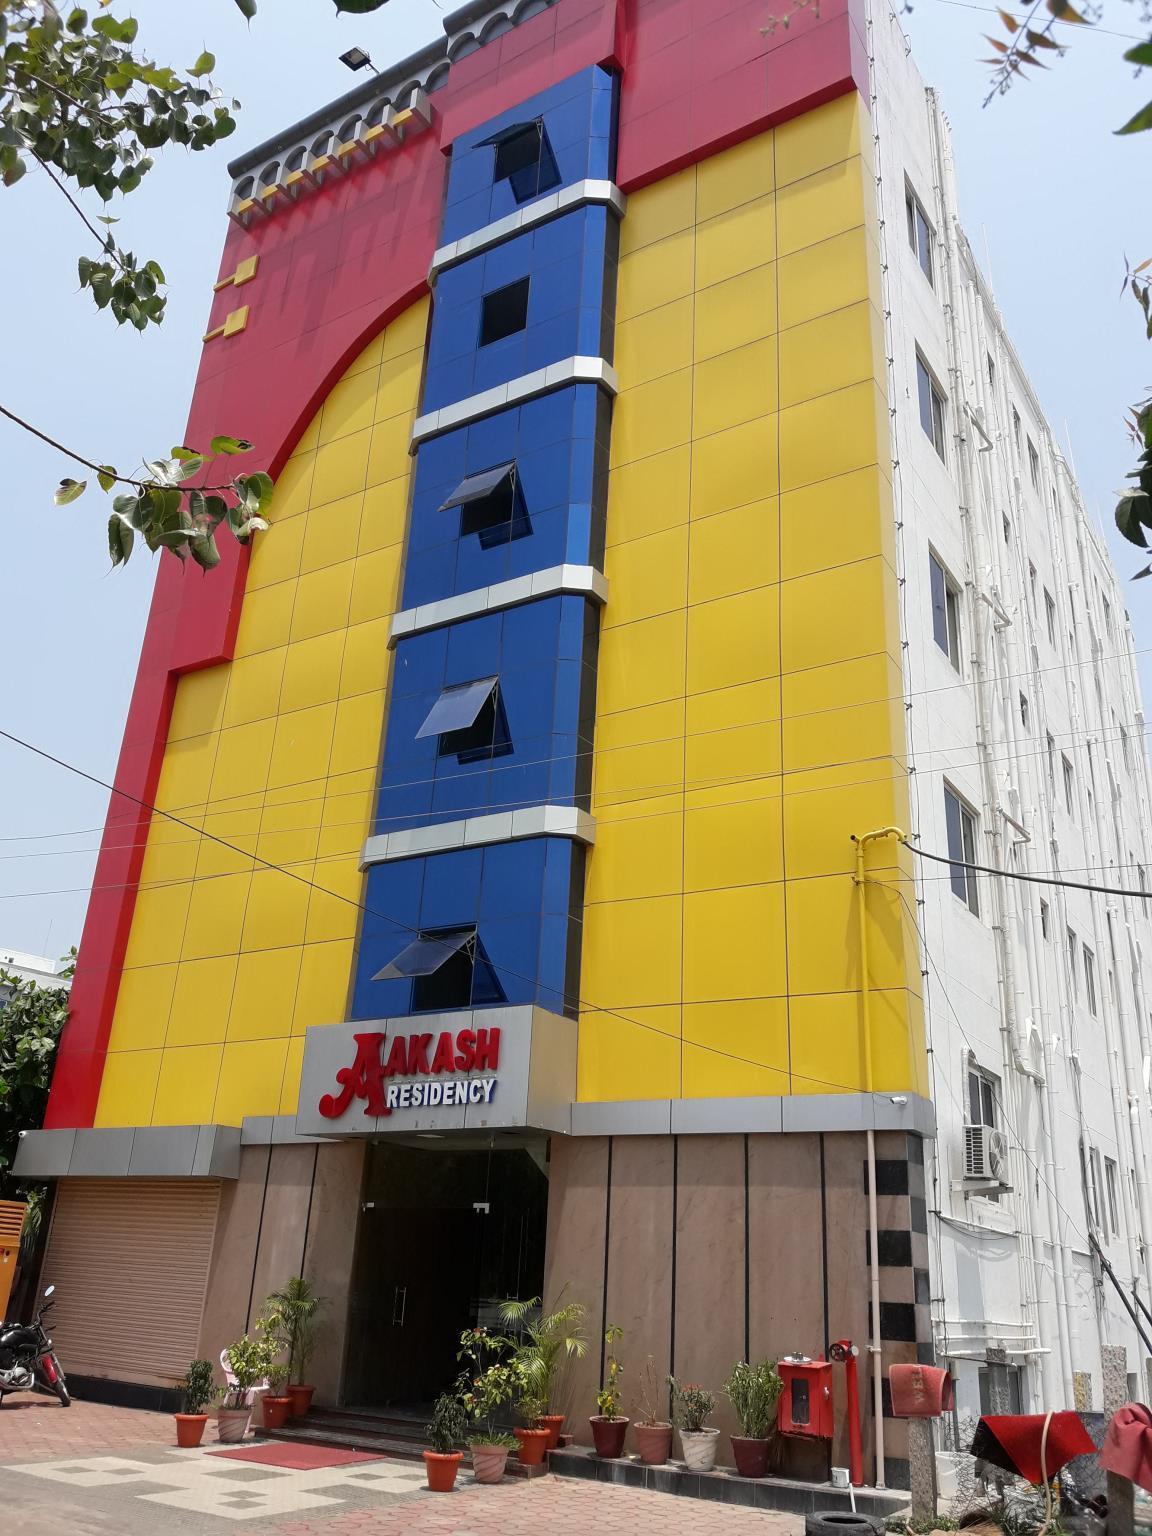 Aakash Residency Madurai, Madurai